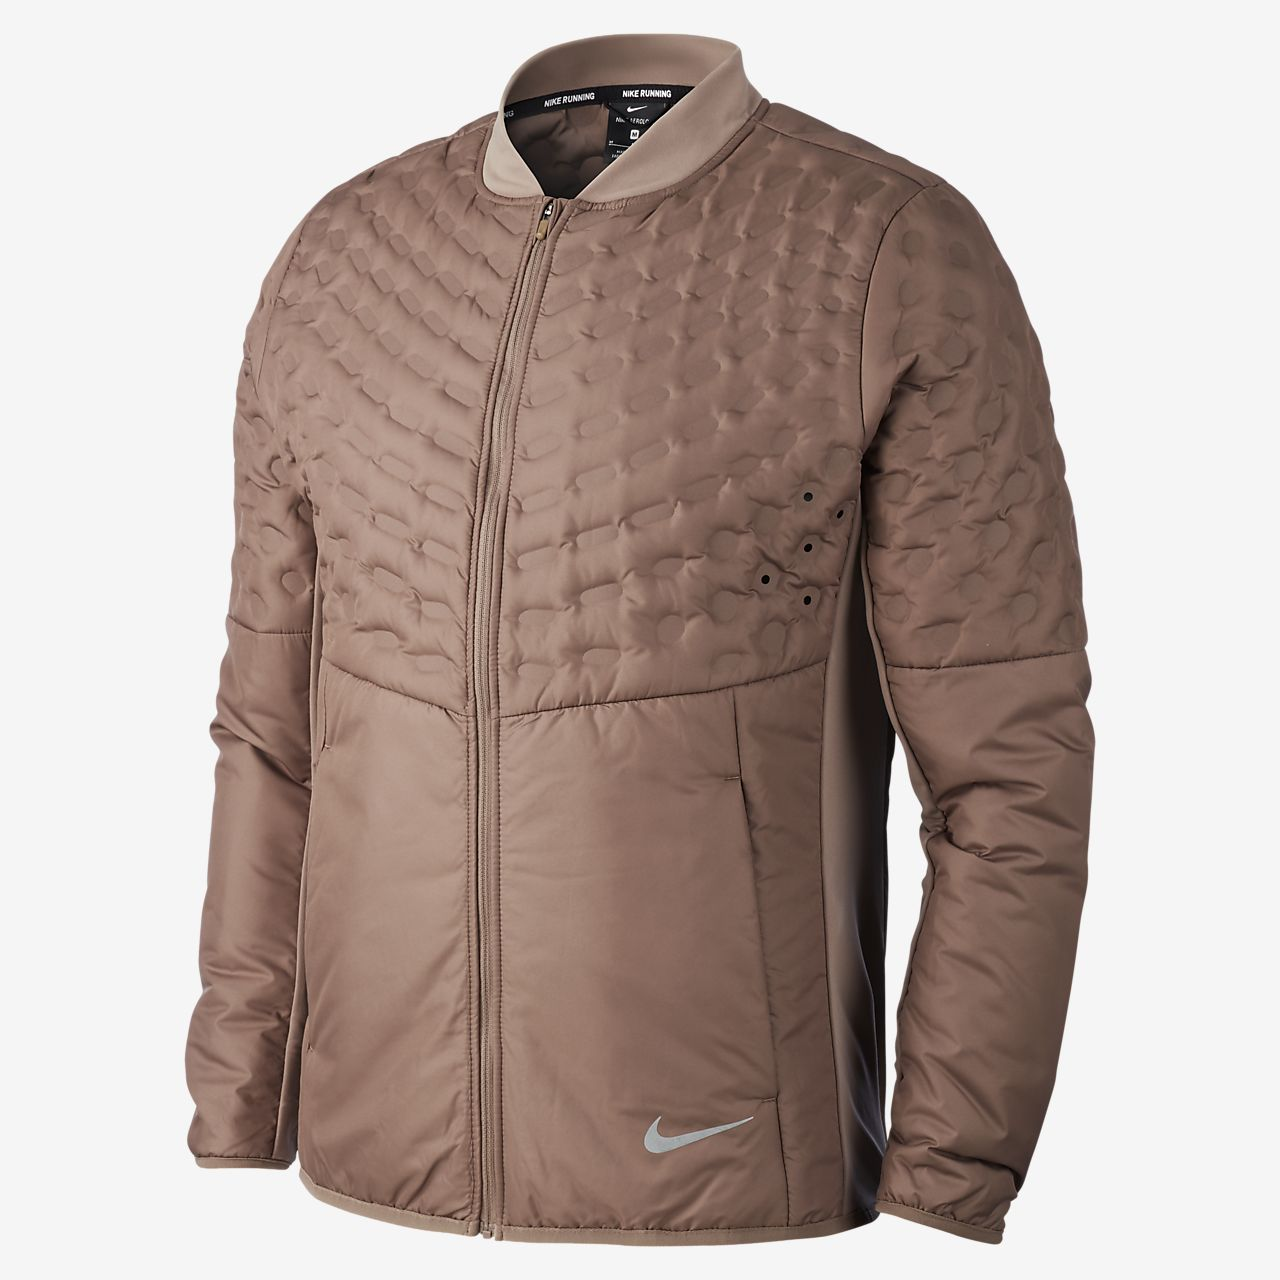 1d54d2ec3 Męska kurtka do biegania Nike AeroLoft. Nike.com PL